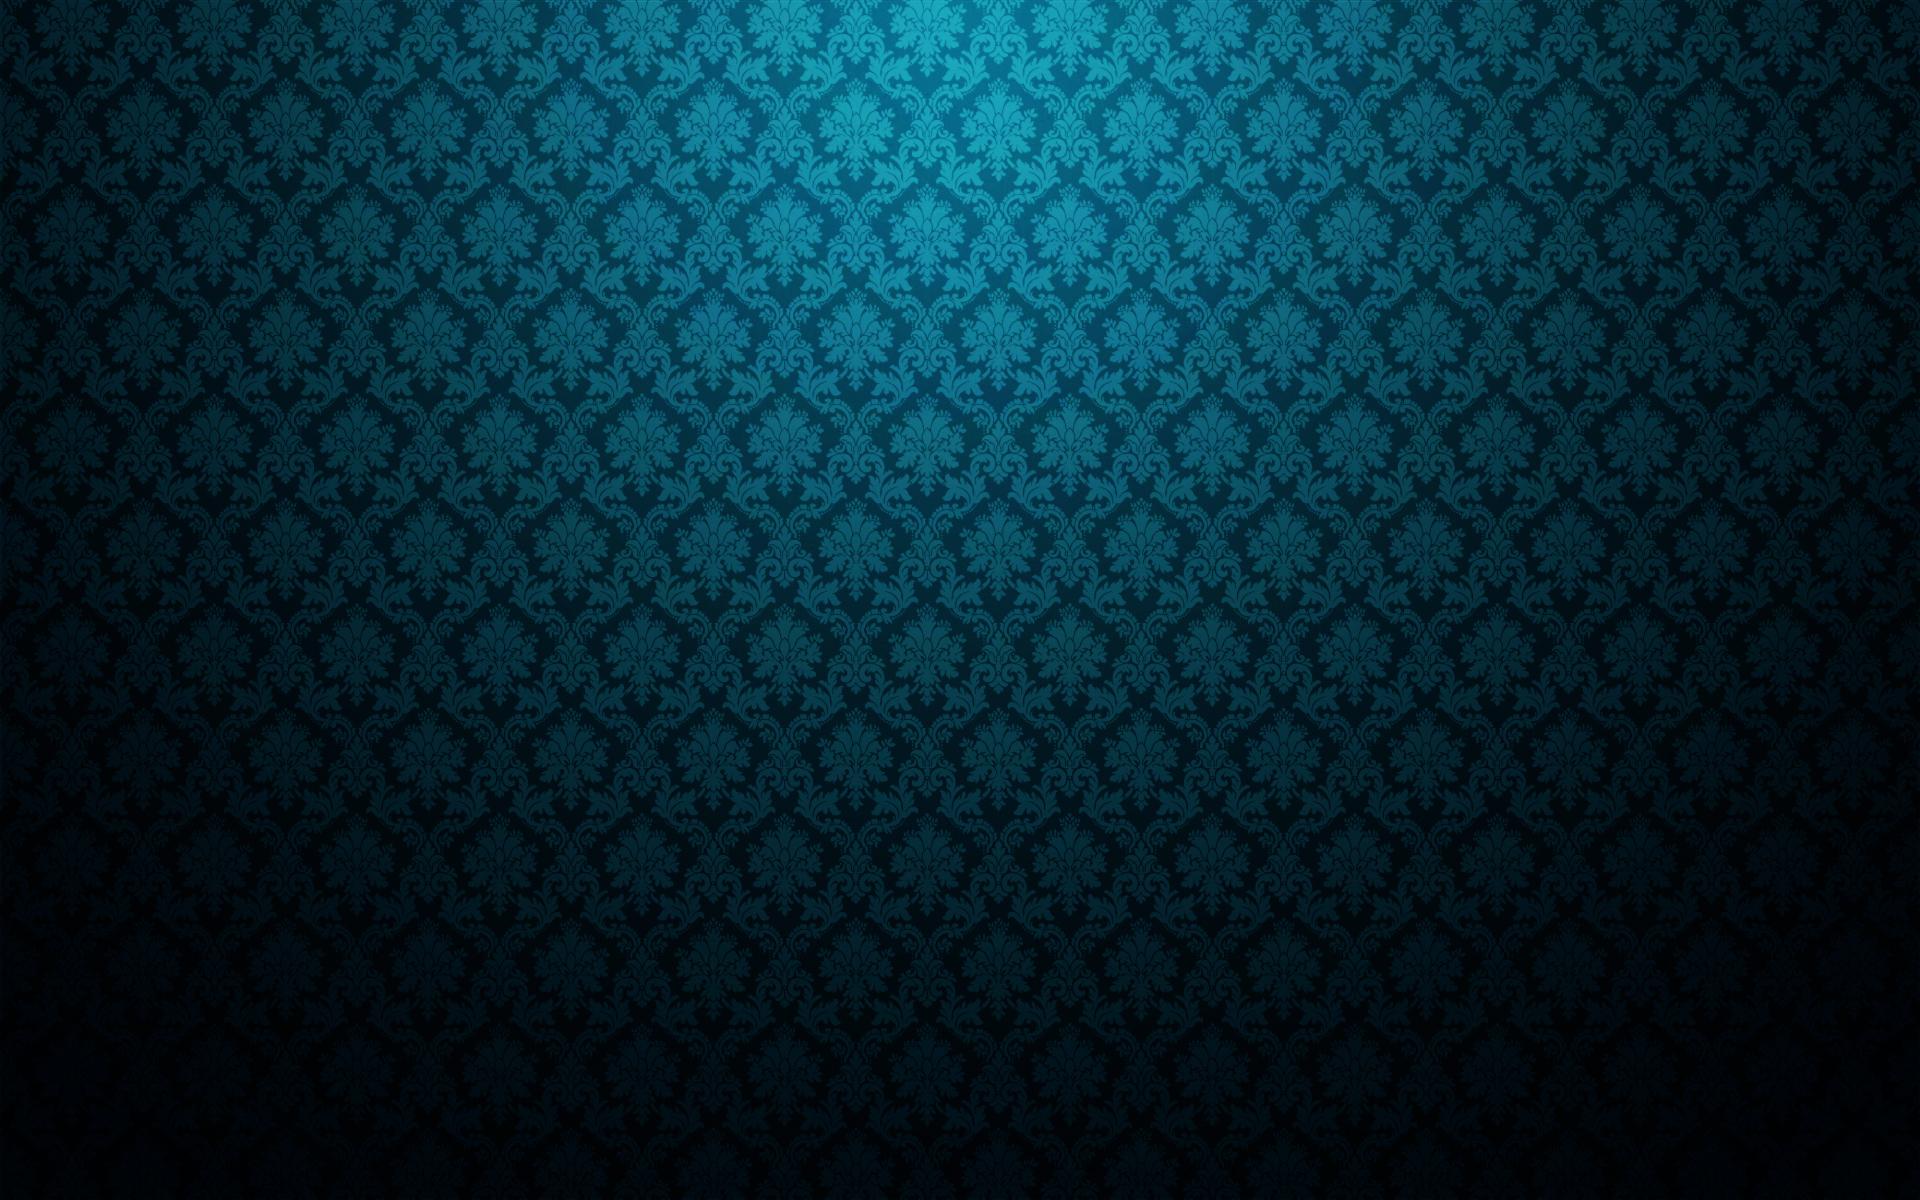 Blue vintage pattern wallpaper   226090 1920x1200